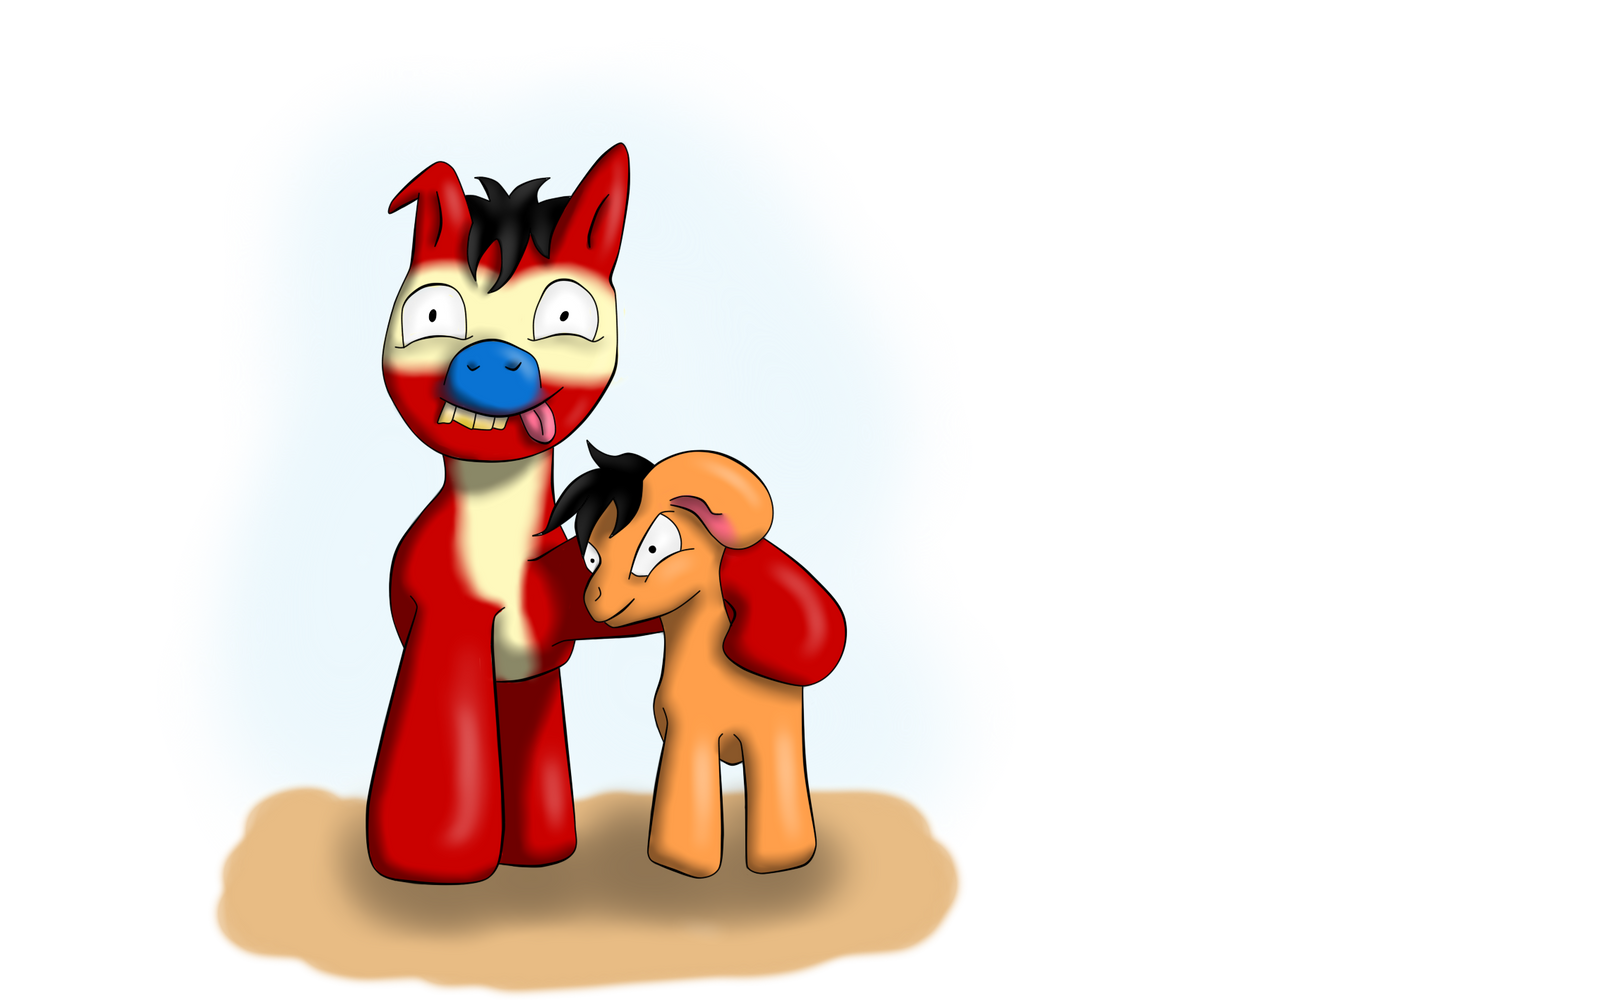 Rene und Stimpy als Pony by PanHaukatze